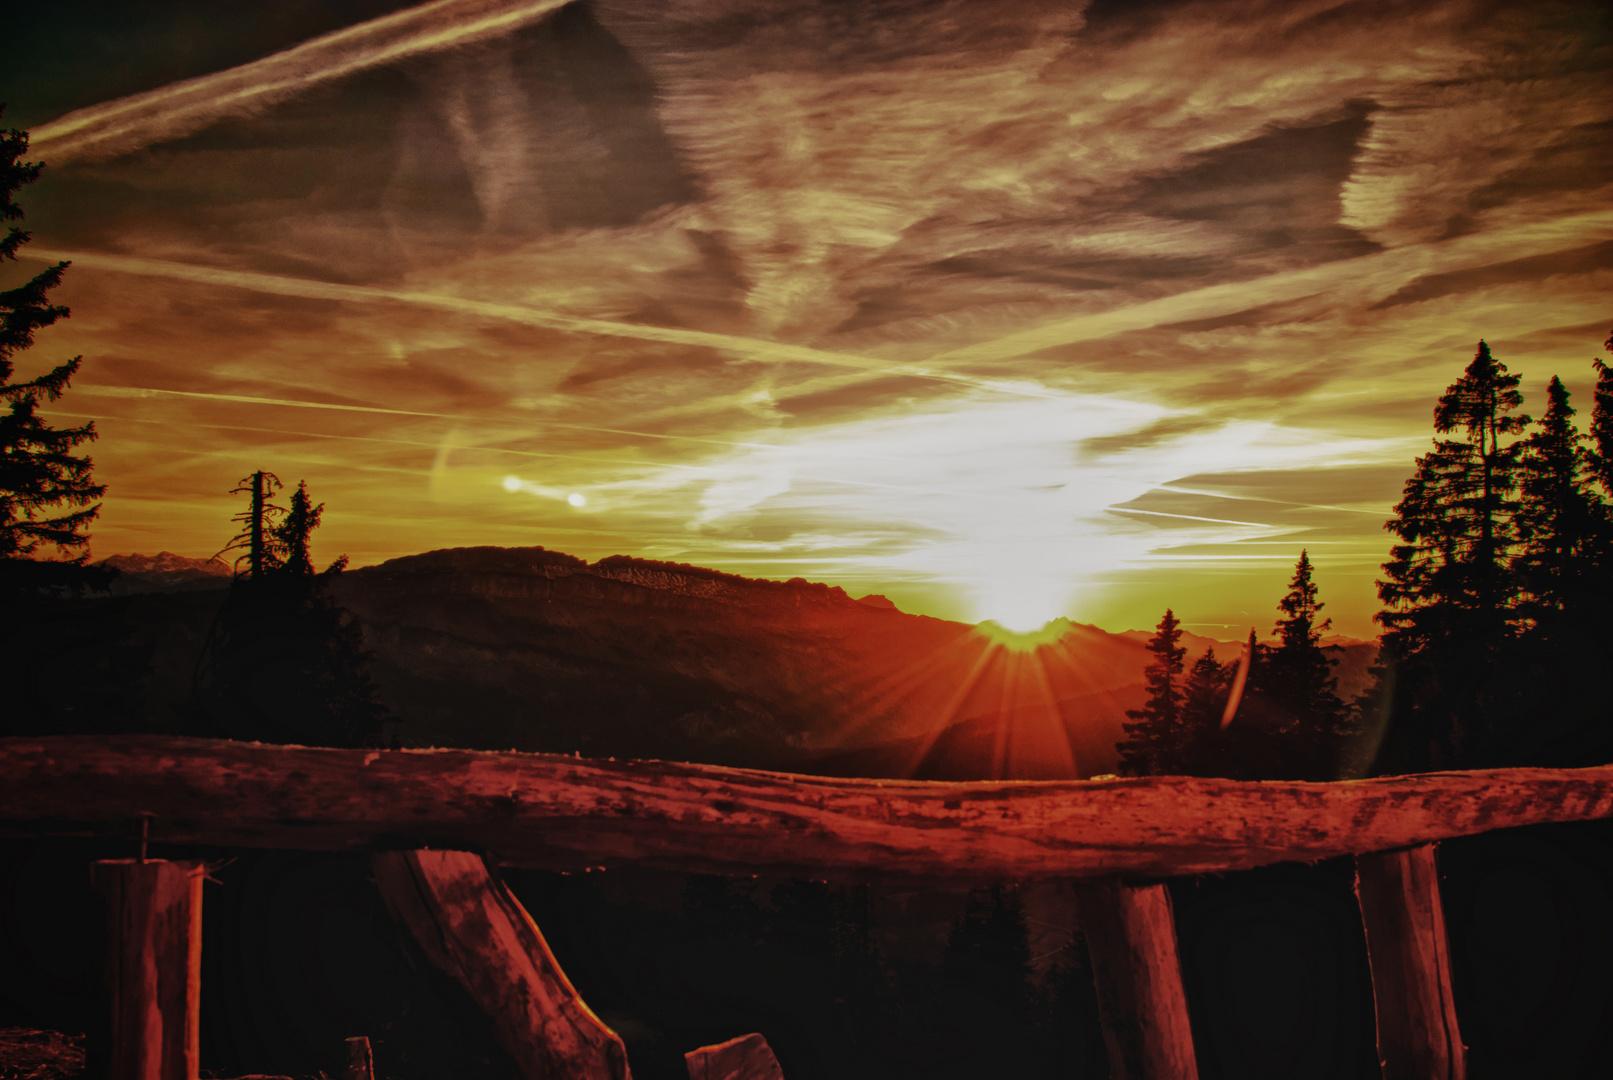 Sonnenuntergang in Hdr-Look